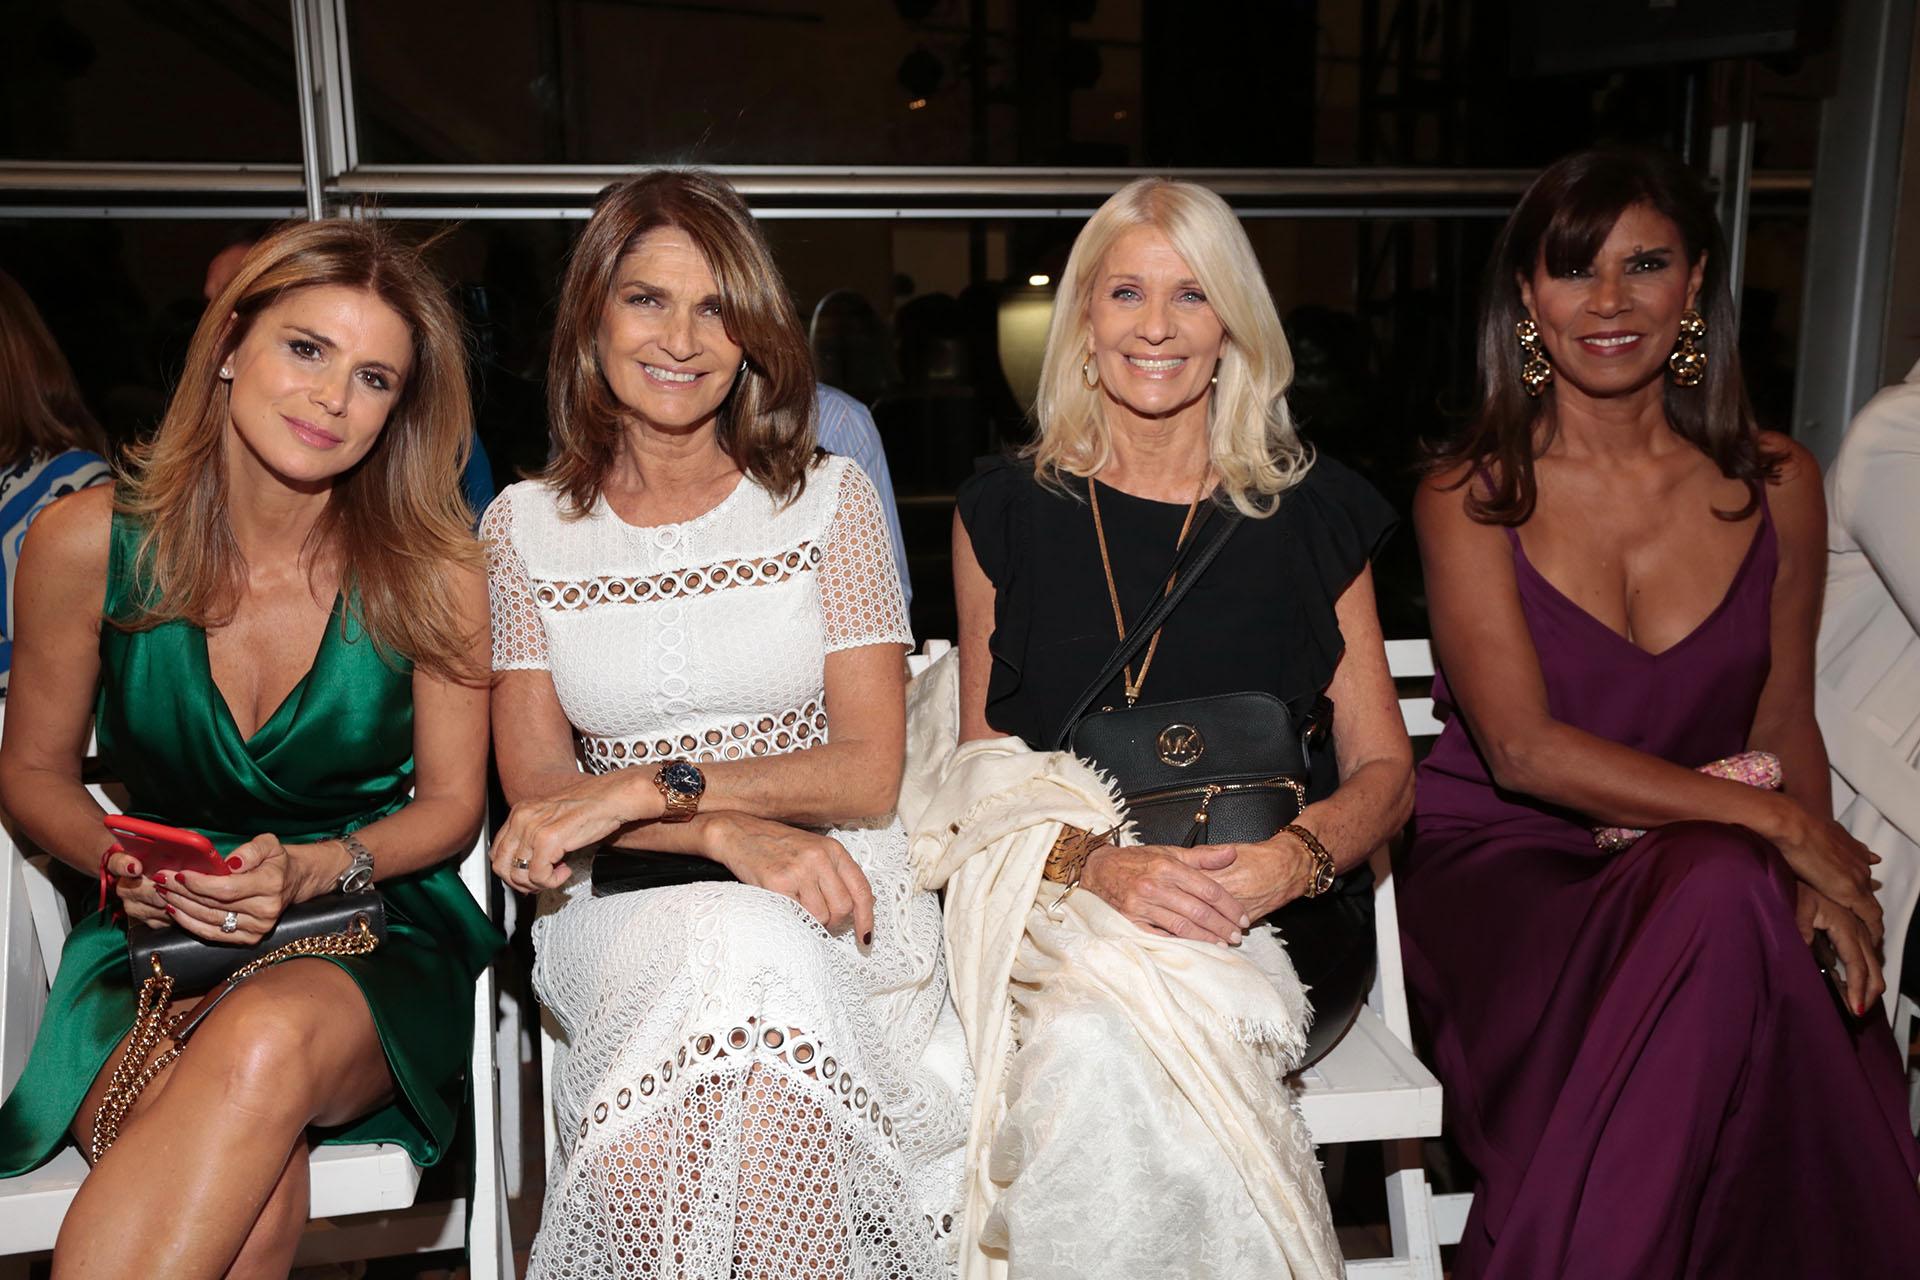 Flavia Palmiero, Teresa Calandra, Evelyn Scheidl y Anamá Ferreira, ex modelos en primera fila